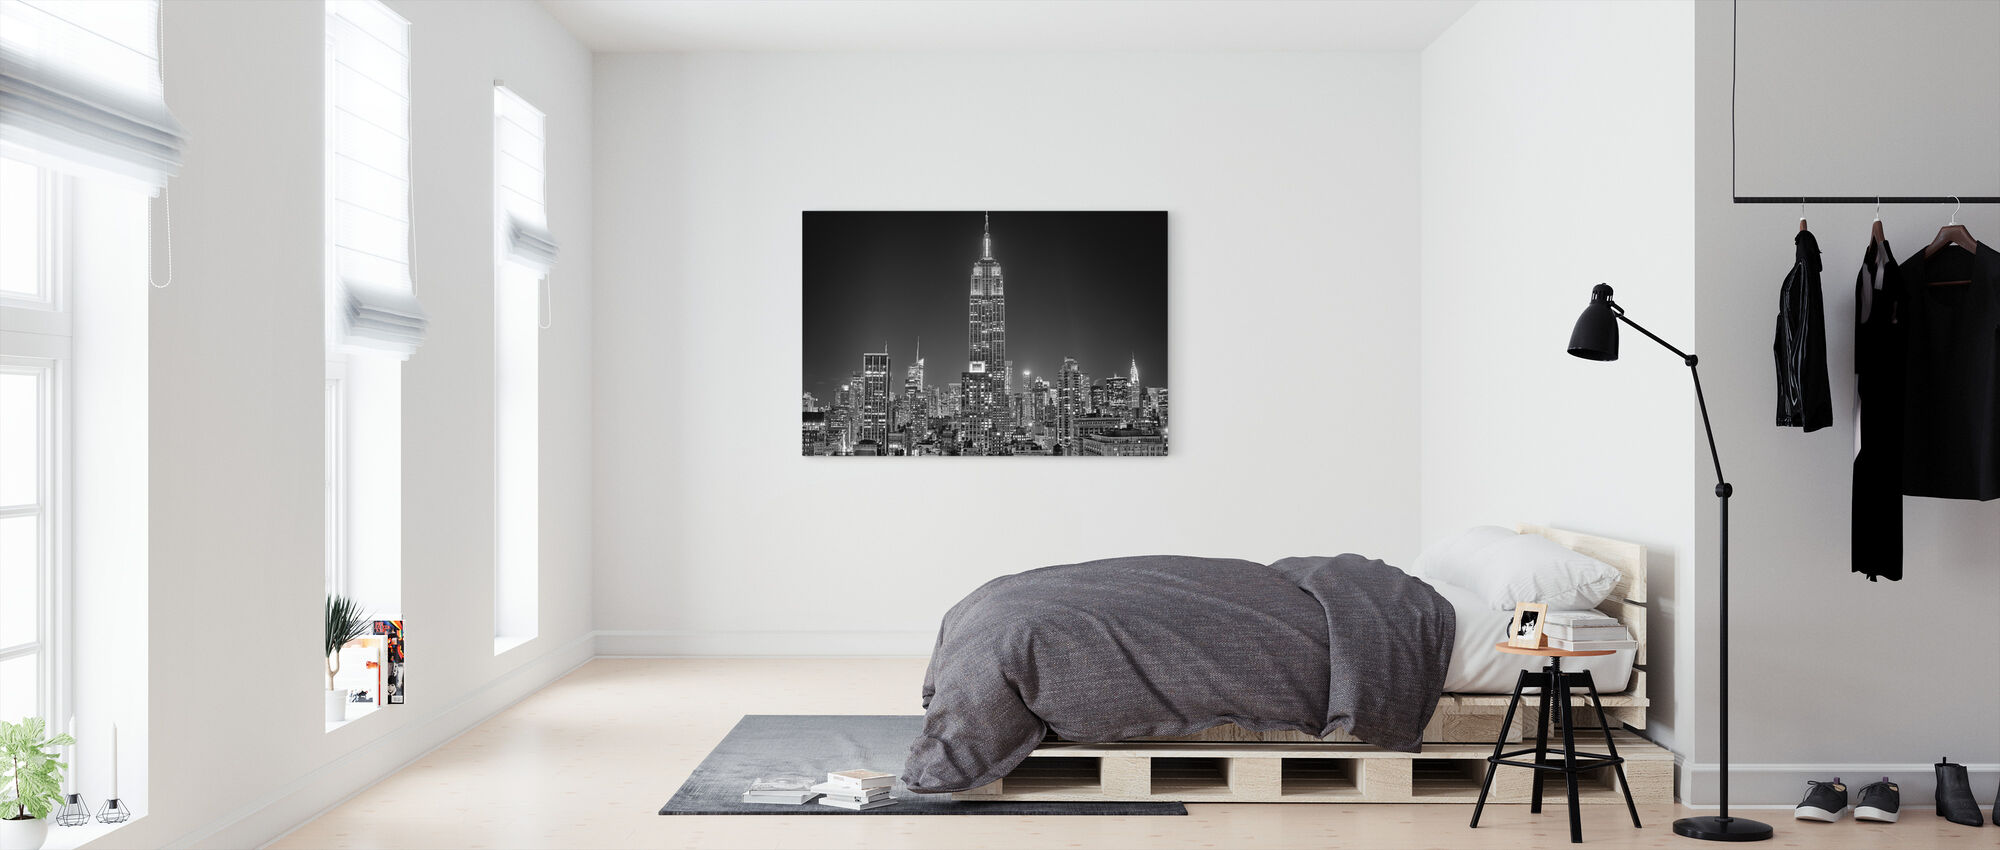 55th Avenue - Canvas print - Bedroom